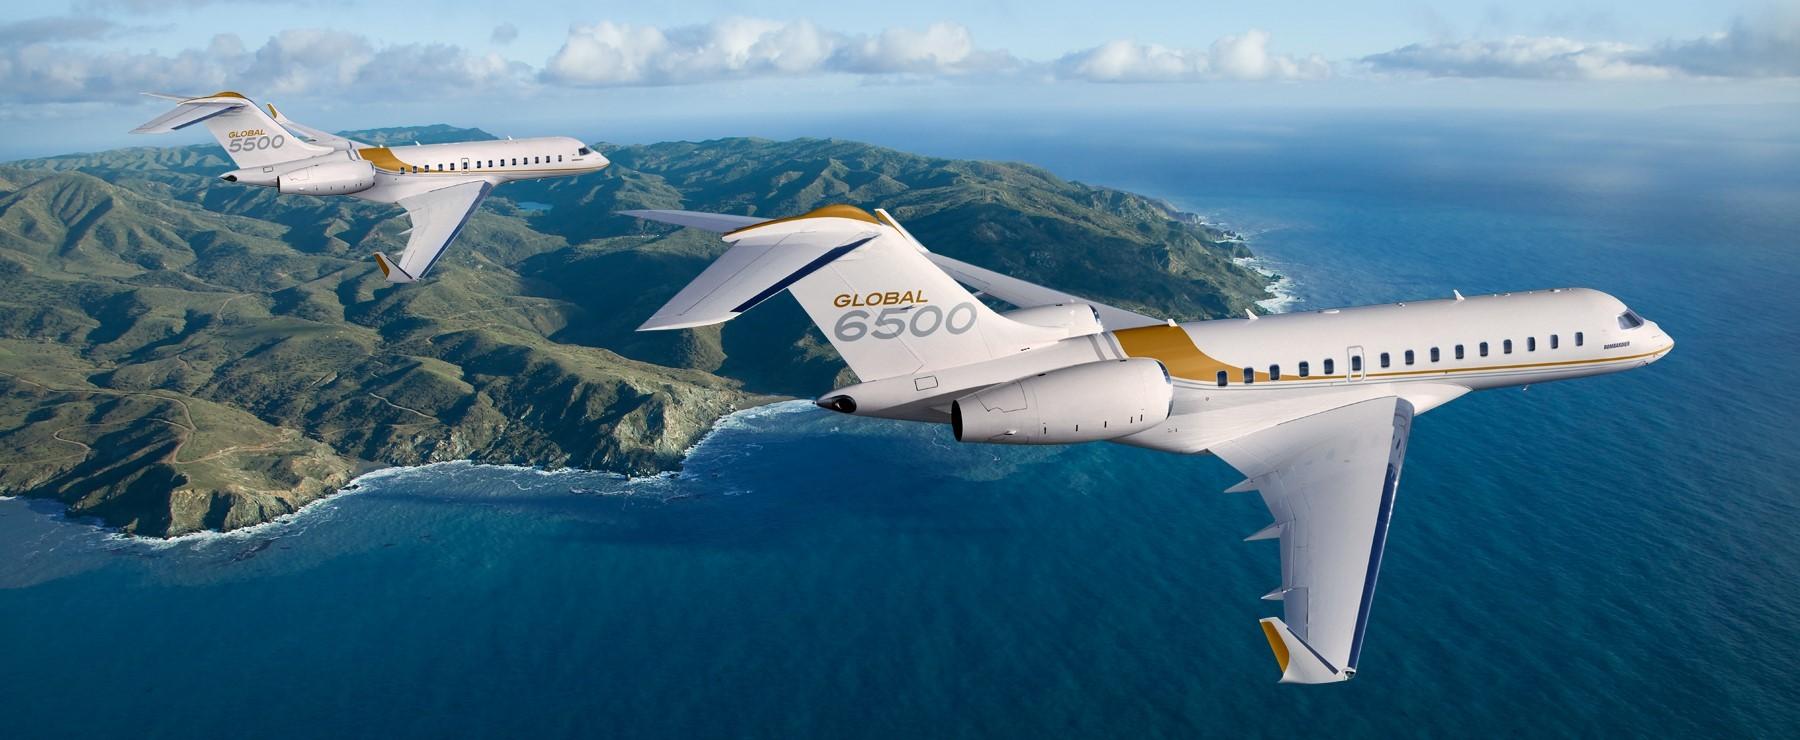 Global 5500 & Global 6500 aircraft